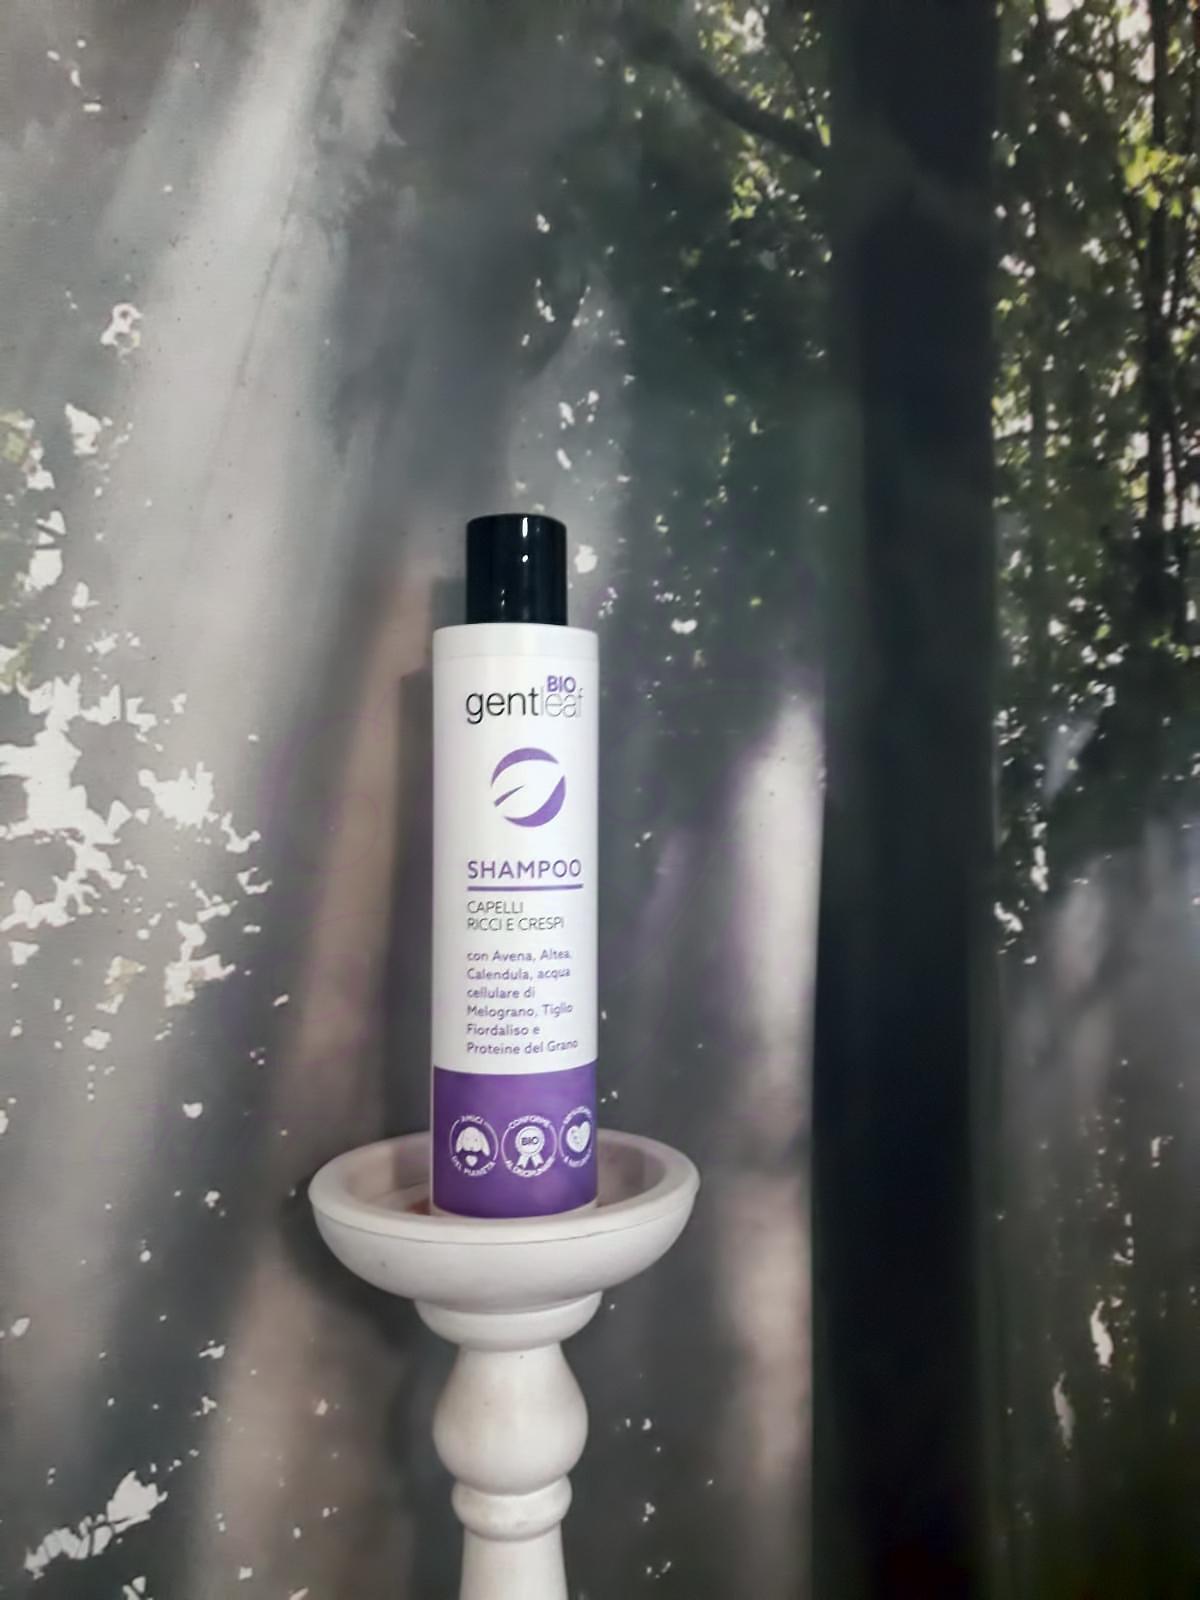 Gentleaf Bio Shampoo per capelli ricci e crespi